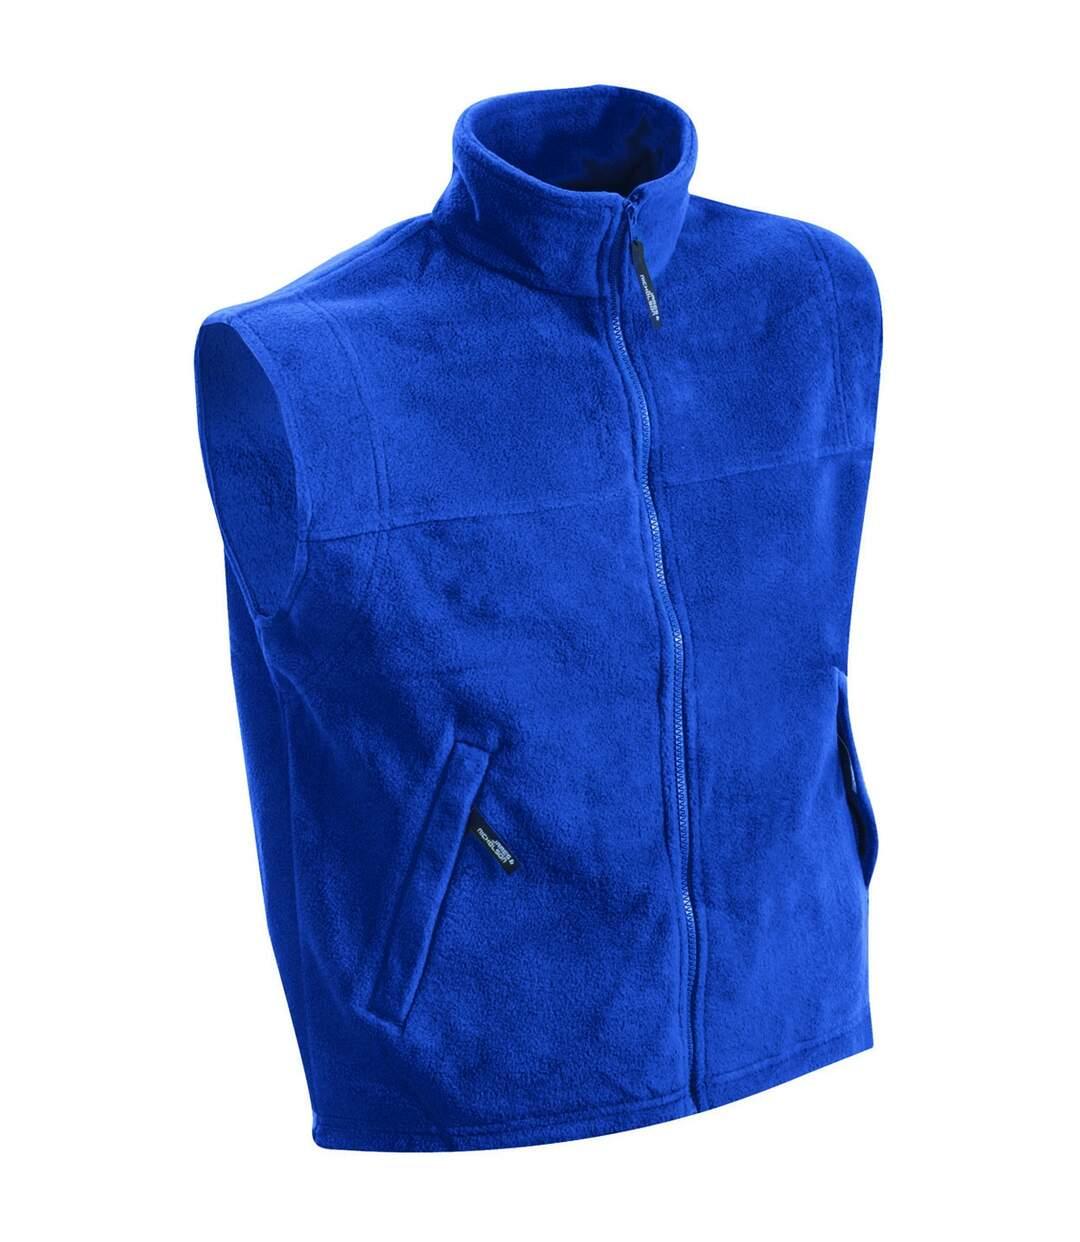 Gilet sans manches bodywarmer polaire homme - JN045 - bleu roi